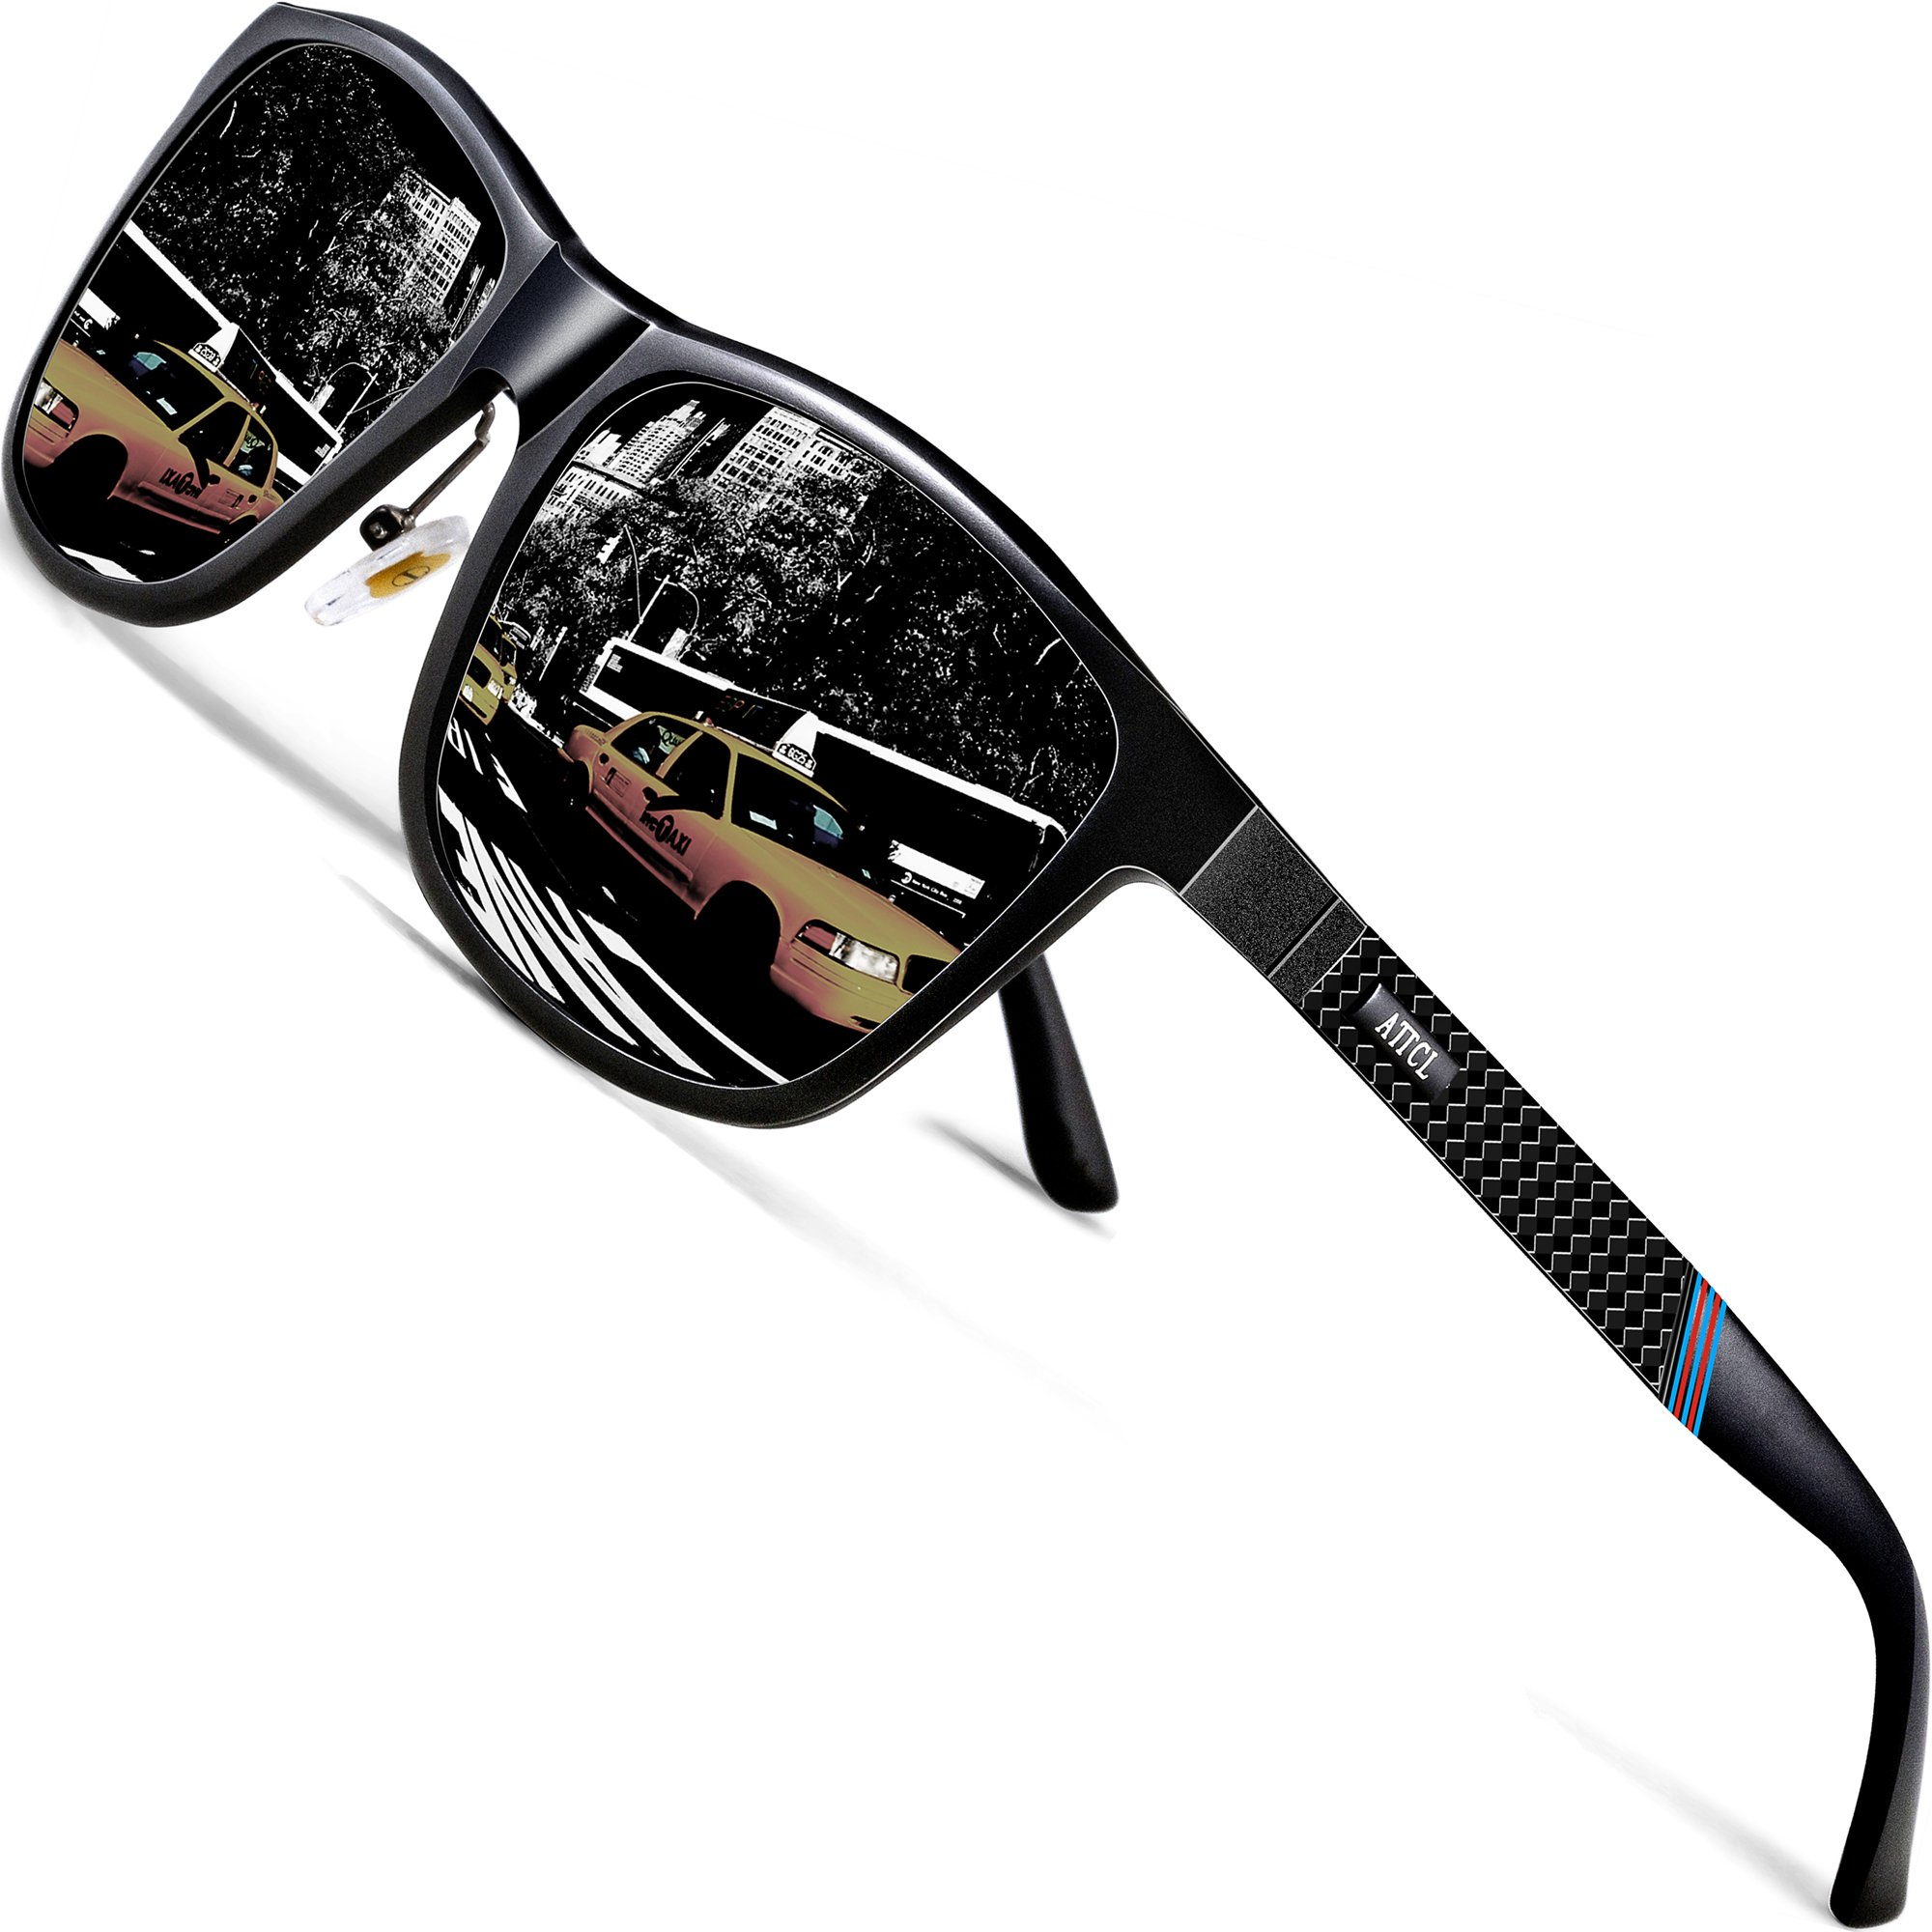 Apparel Accessories Charitable Women Men Denim Hard Shell Eyewear Case Fabric Box Shell Eyeglasses Sunglasses Protector Random Color Eyewear Accessories